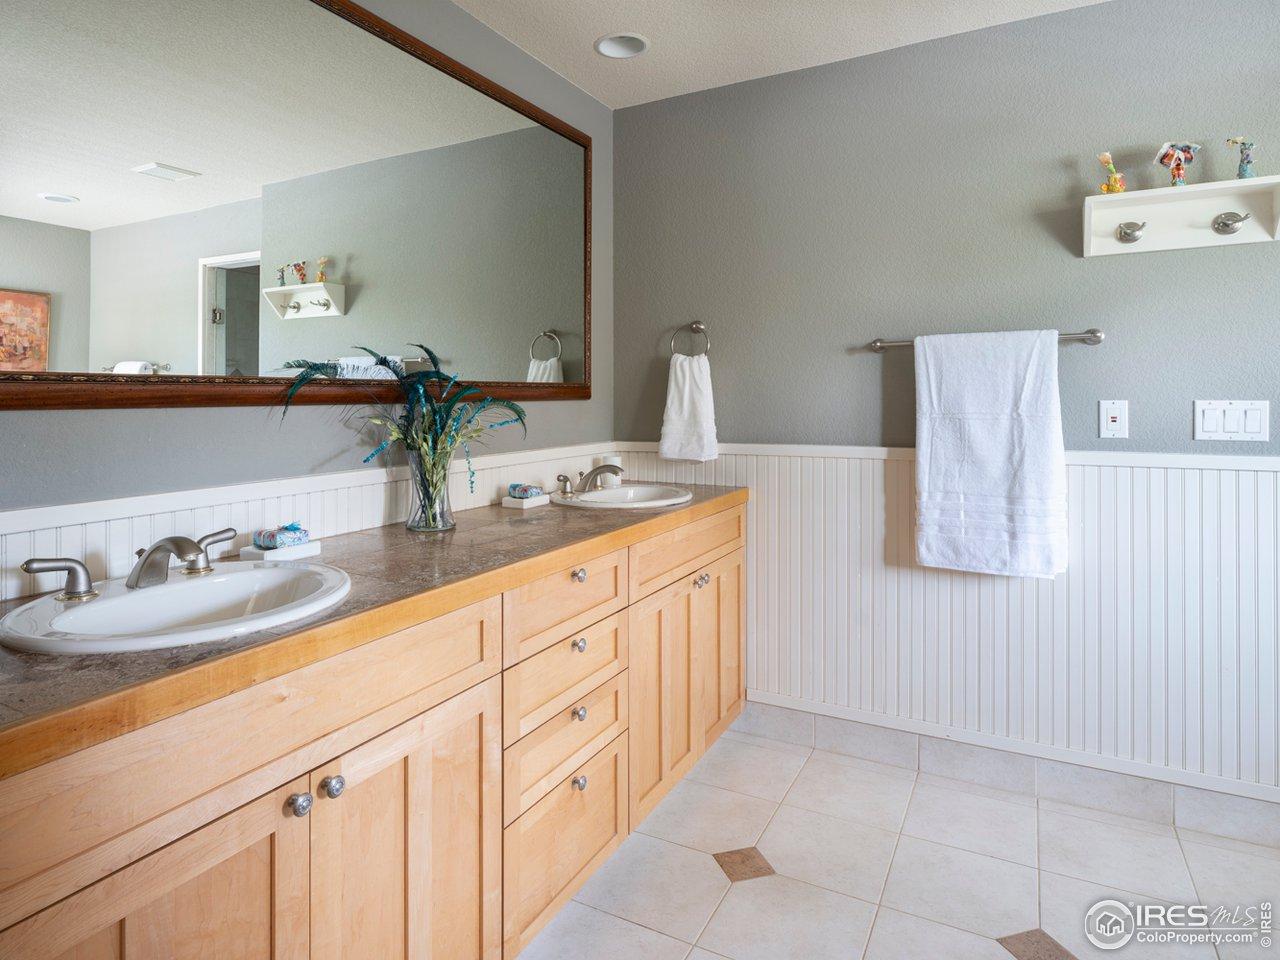 Primary bedroom bathroom